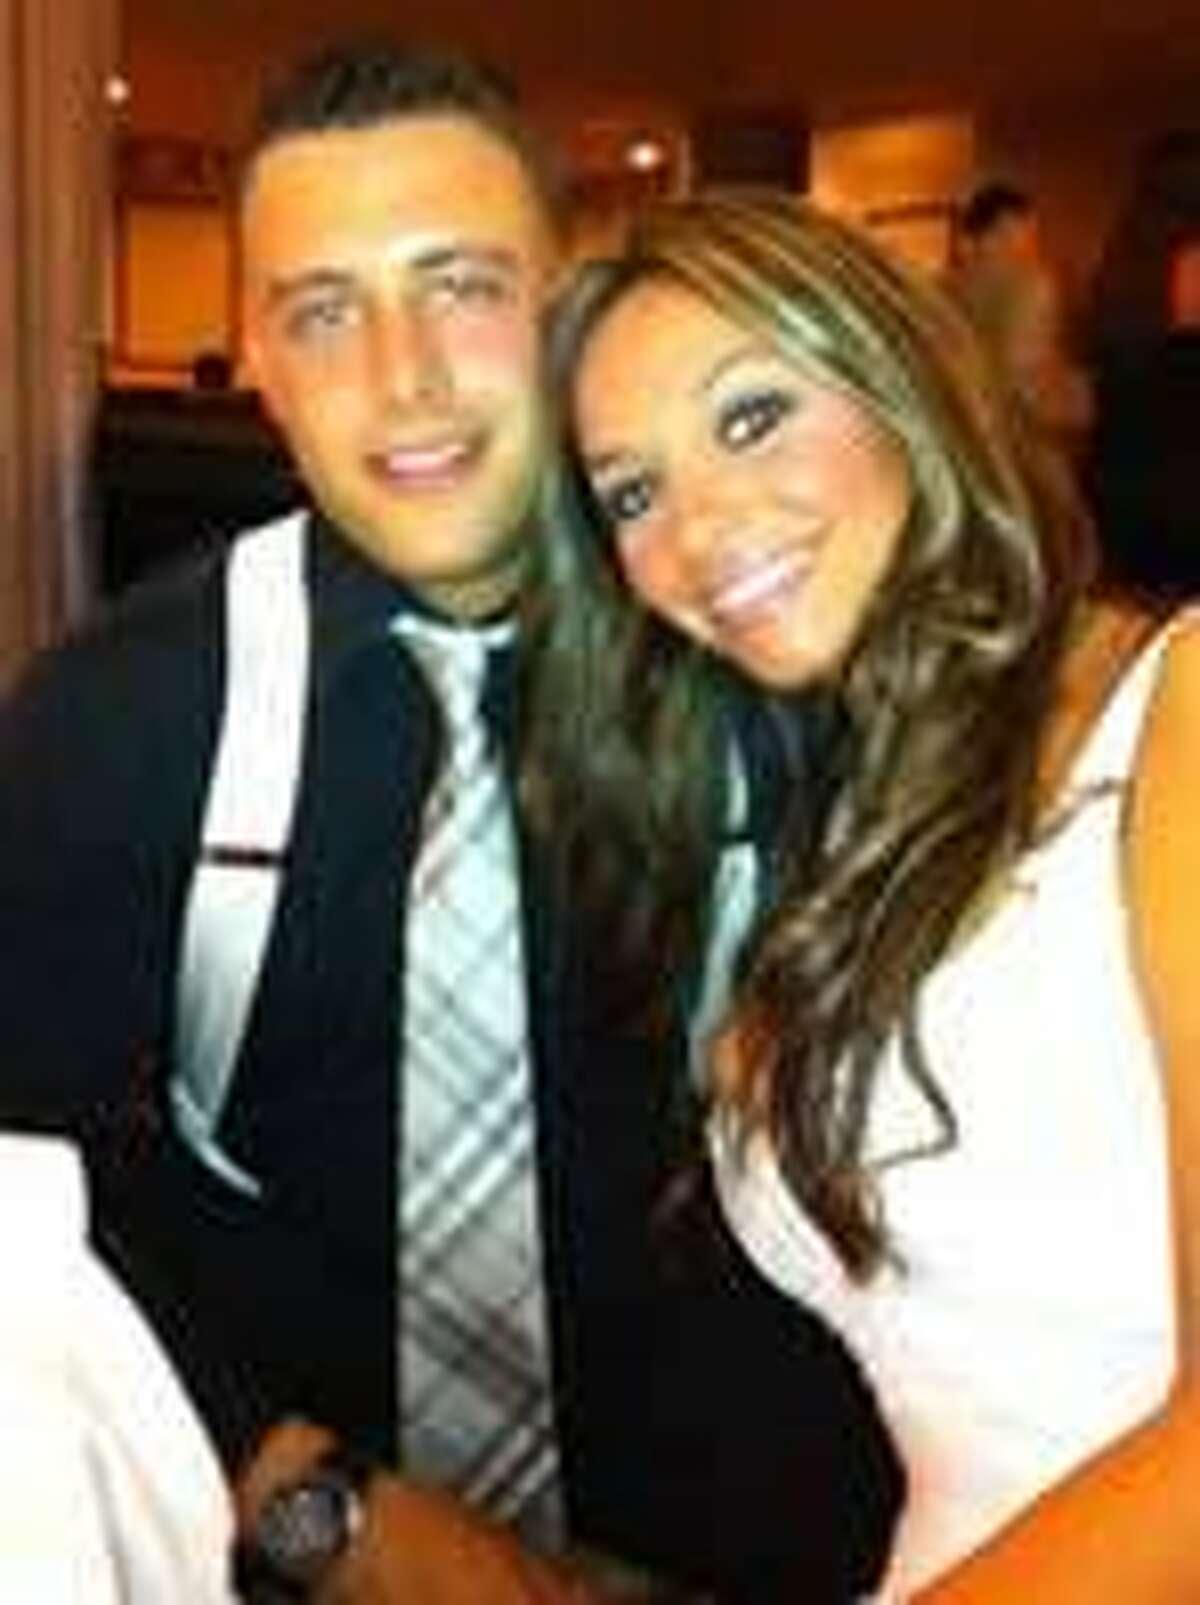 Joey Comunale and Elisa Libretto.